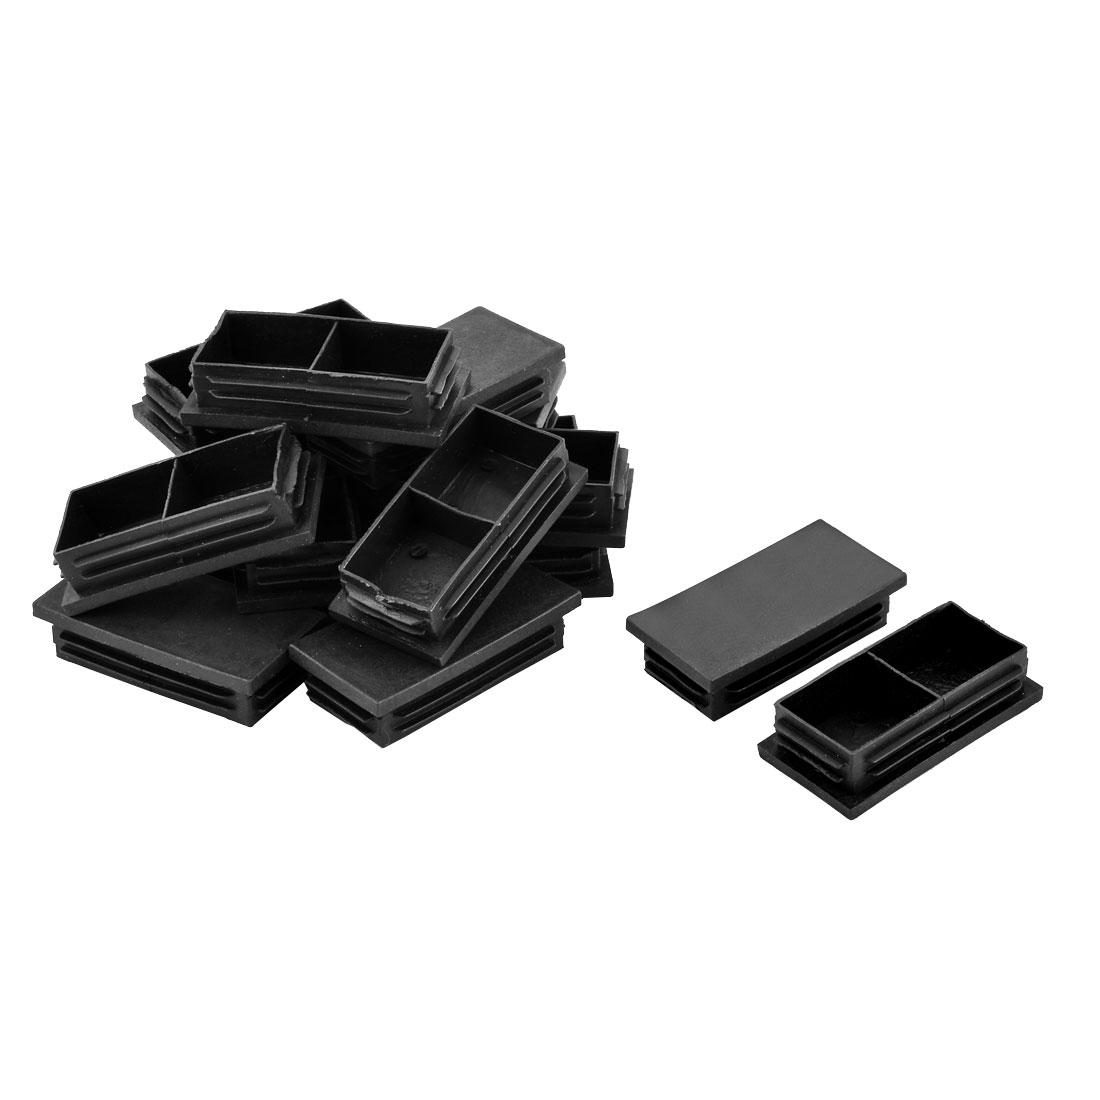 Table Chair Legs Plastic Tube Inserts End Blanking Caps Black 79 x 39mm 16pcs